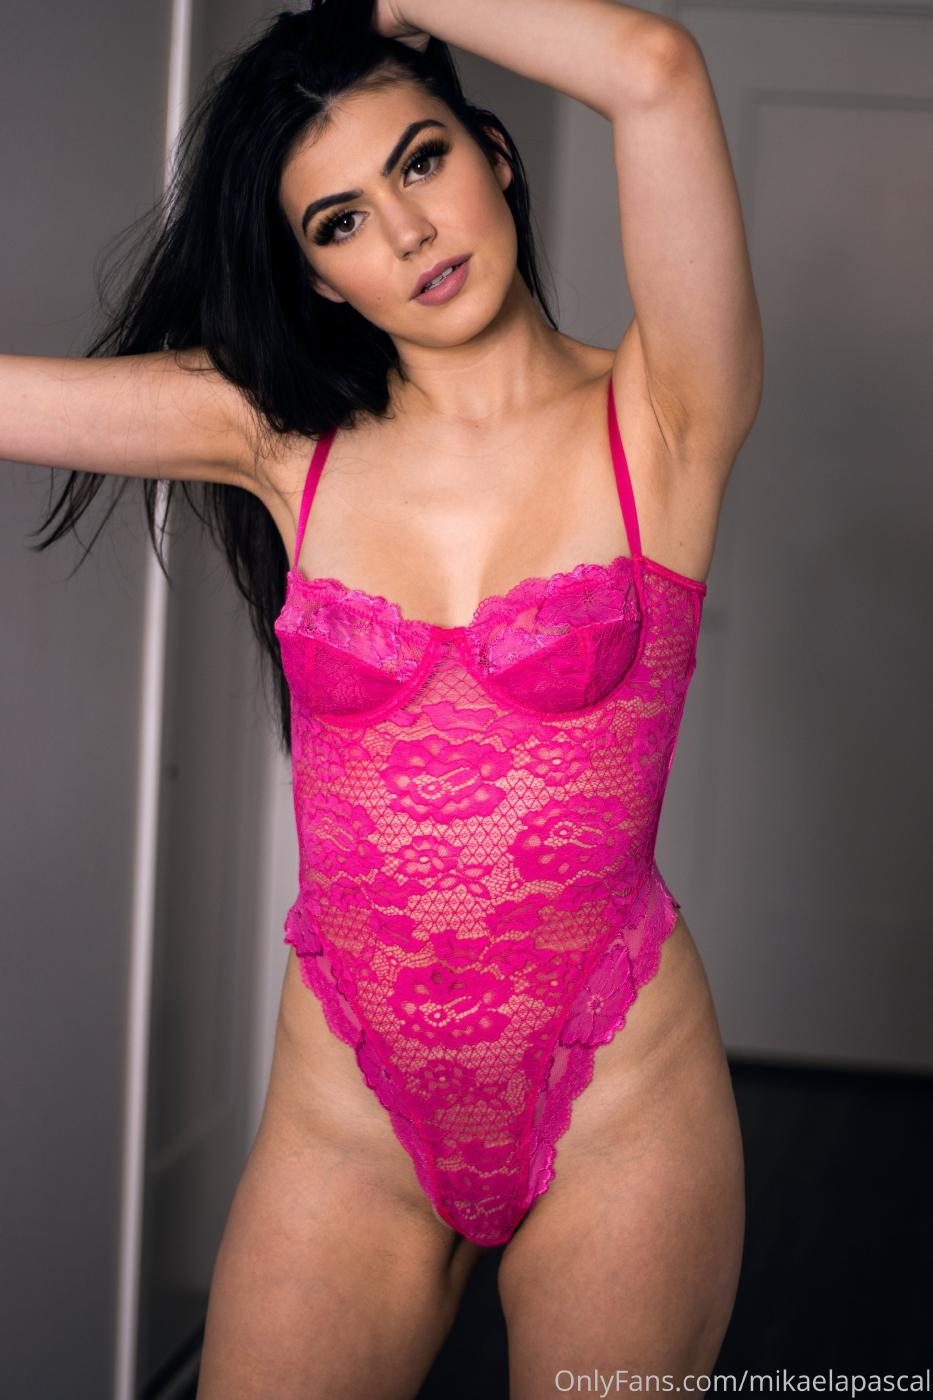 Mikaela Pascal Pink Bodysuit Lingerie Onlyfans Set Leaked Zbmtiv